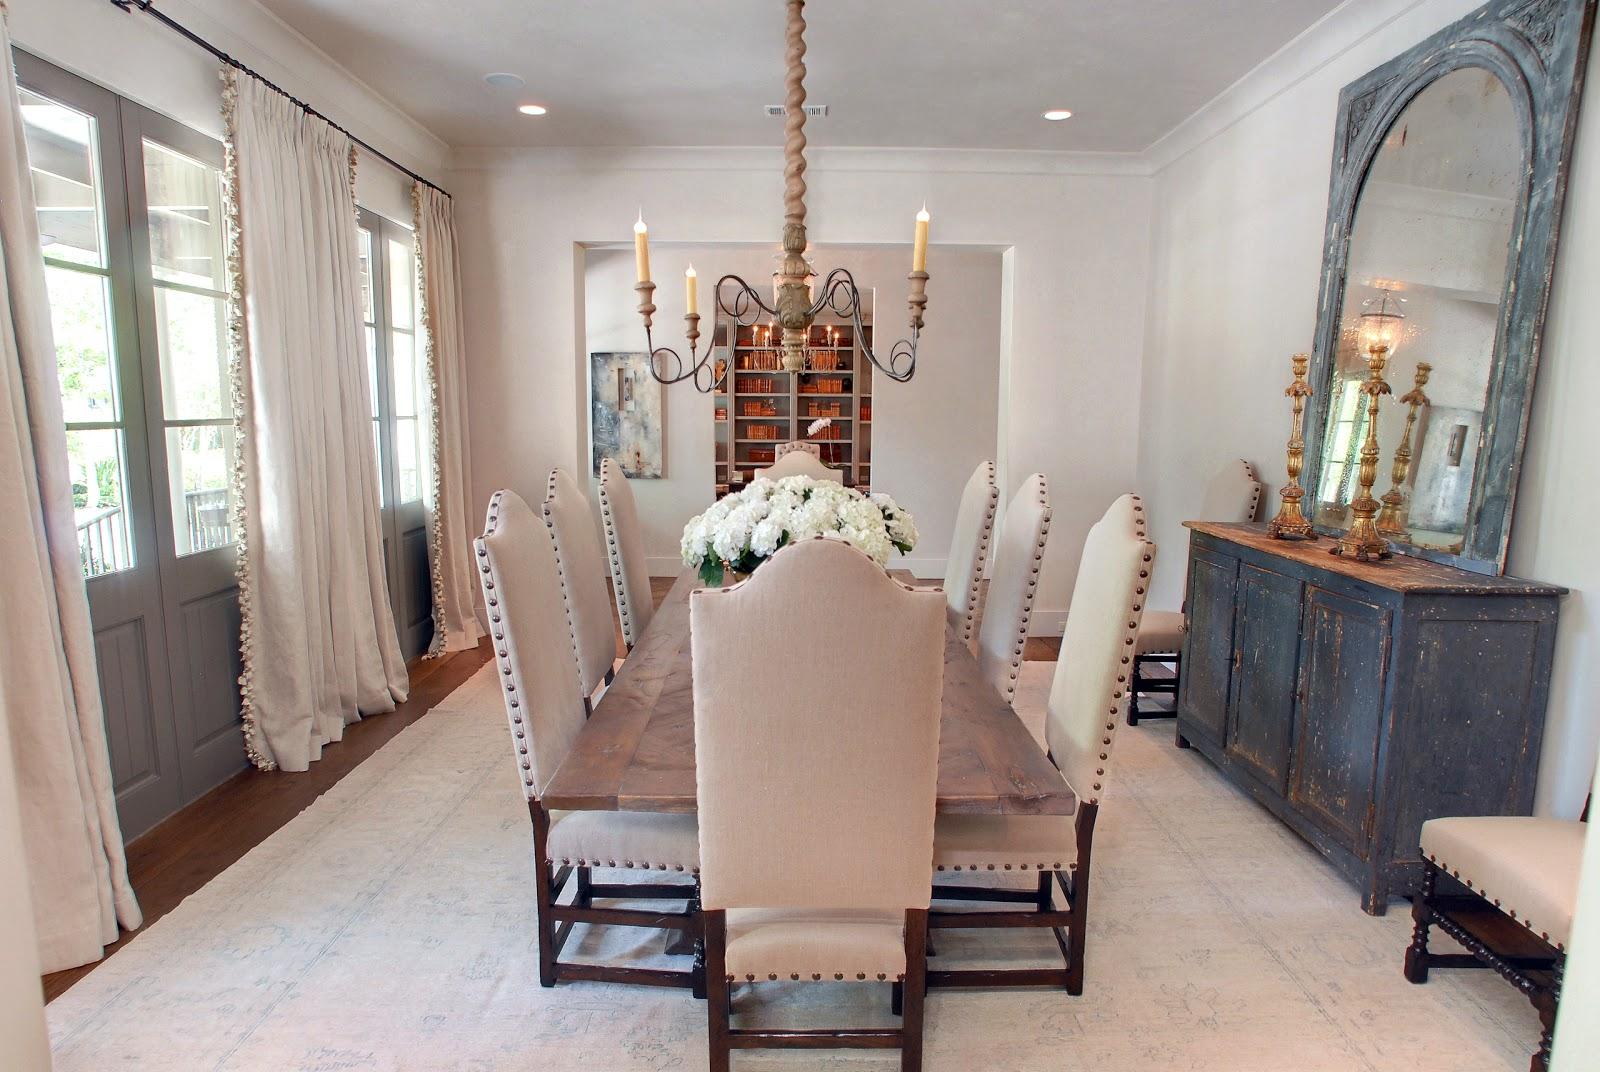 Acadian Style Home Decor House Design Plans Home Decorators Catalog Best Ideas of Home Decor and Design [homedecoratorscatalog.us]